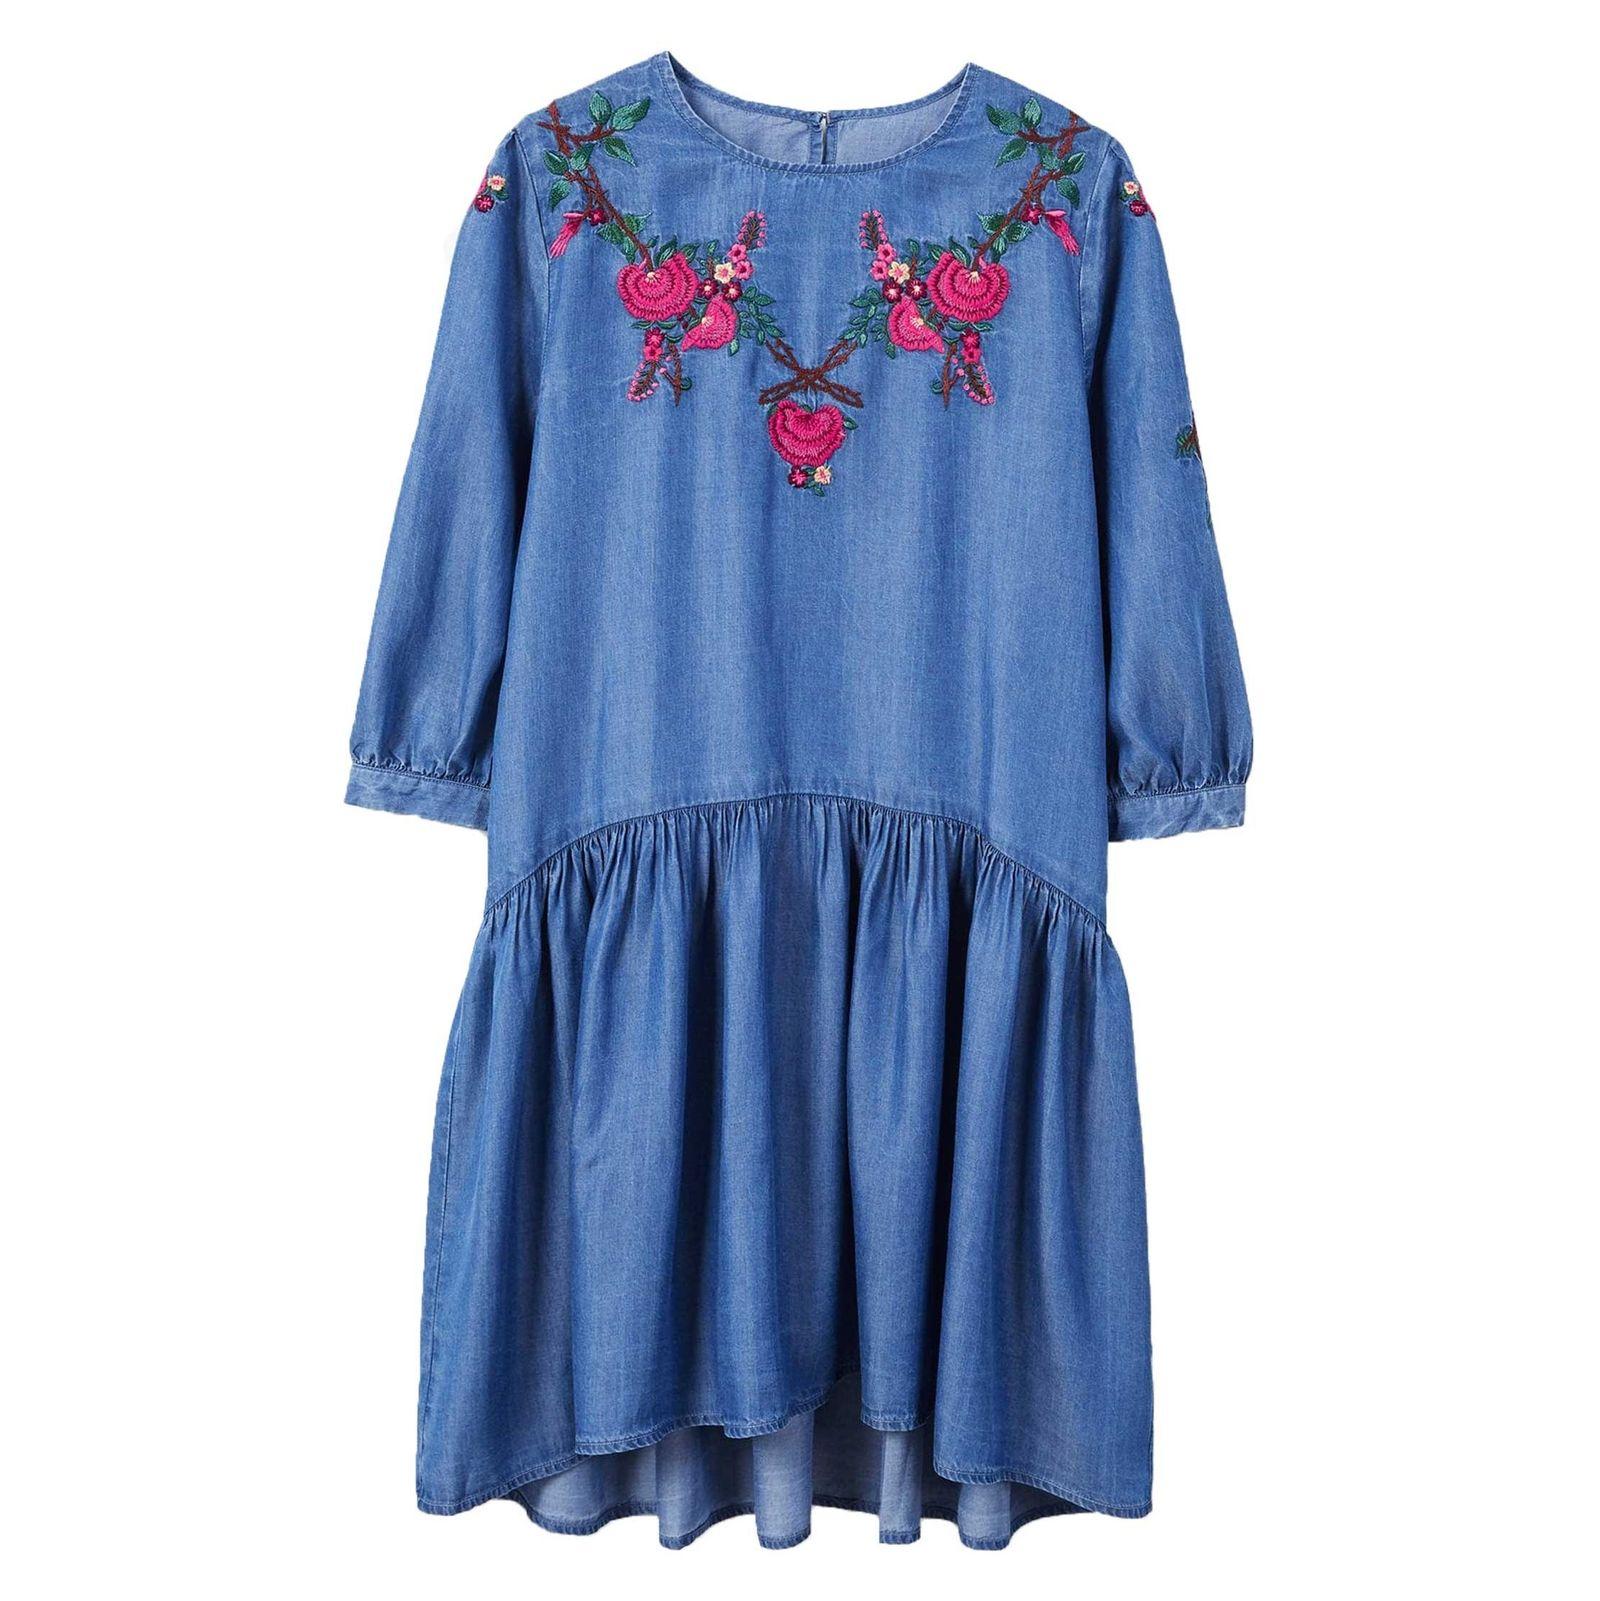 پیراهن کوتاه زنانه - مانگو - آبي - 1